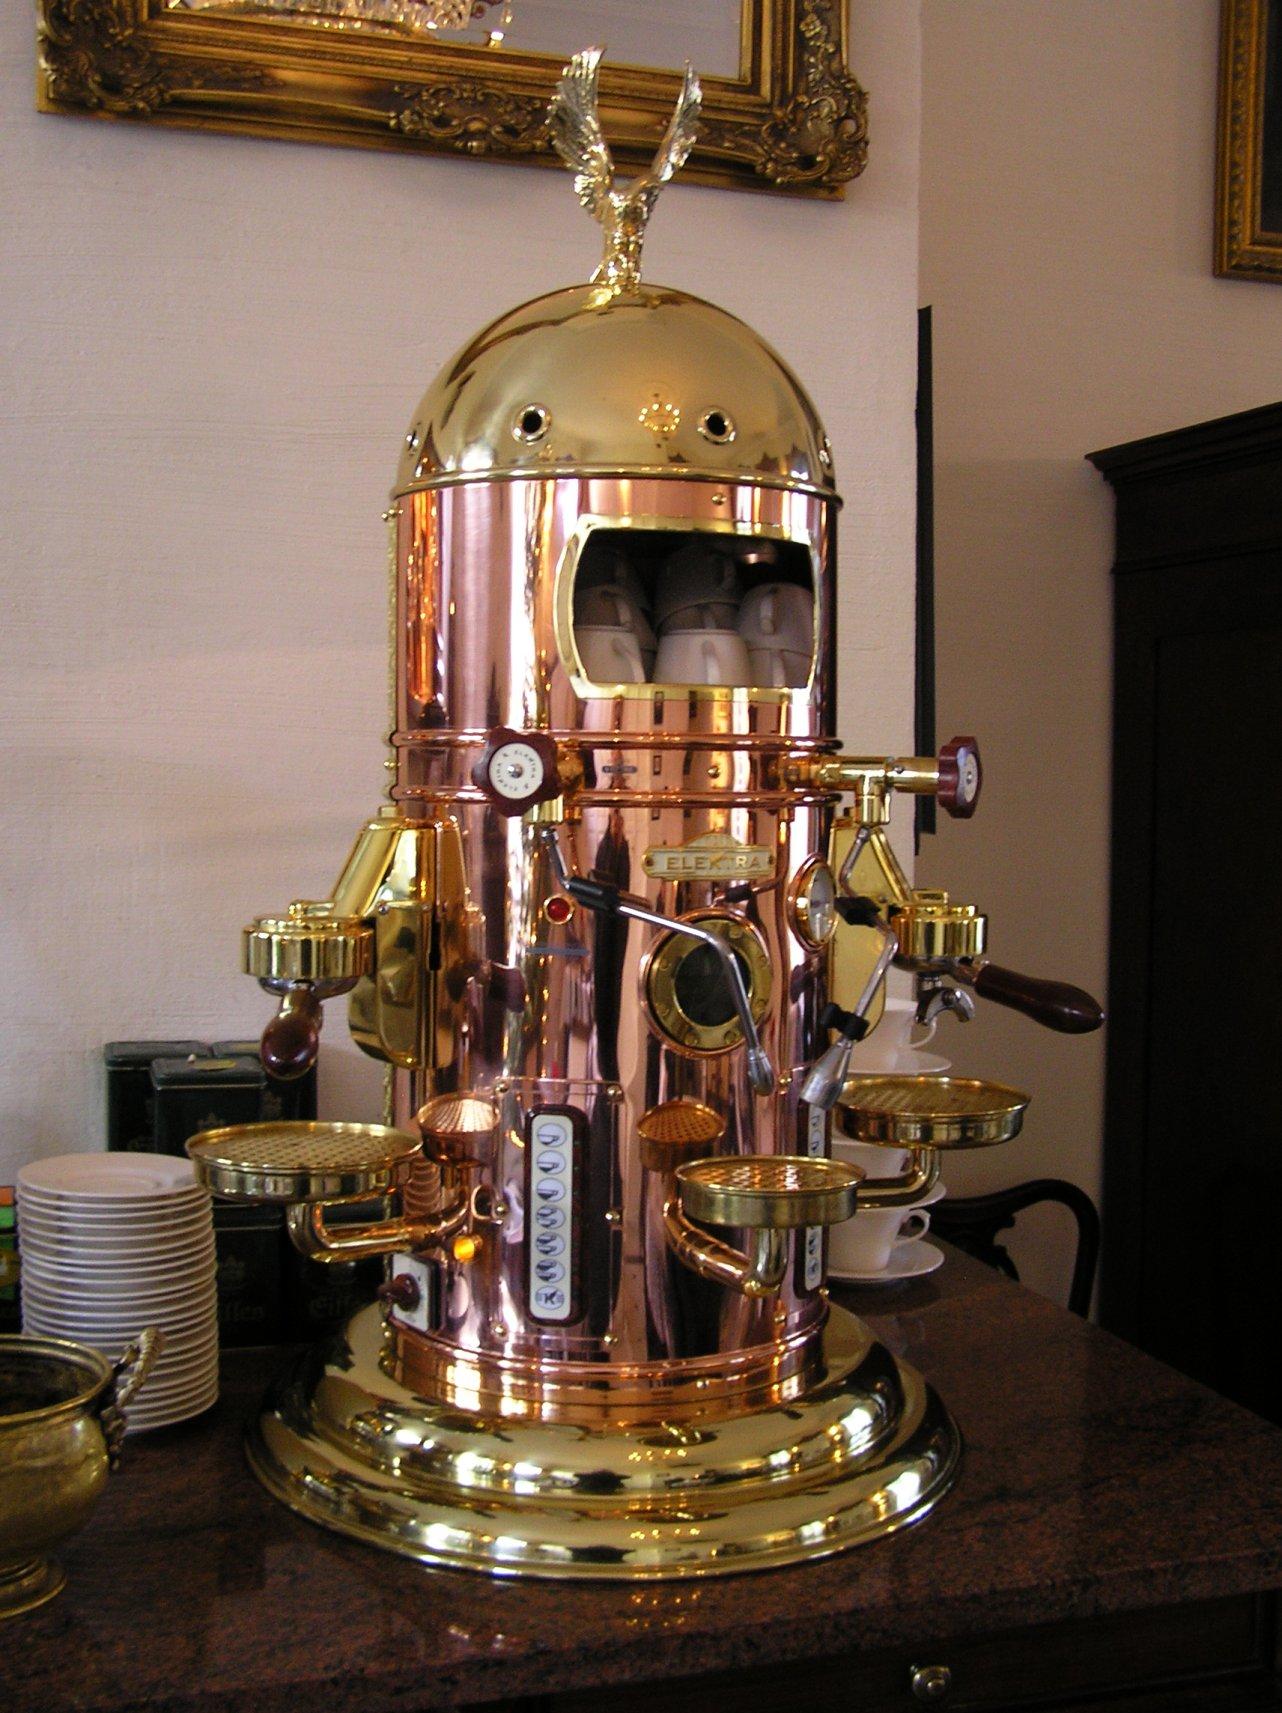 Italian Coffee Maker Grind Size : File:Espresso machine coffee rrn electra beentree.jpg - Wikimedia Commons